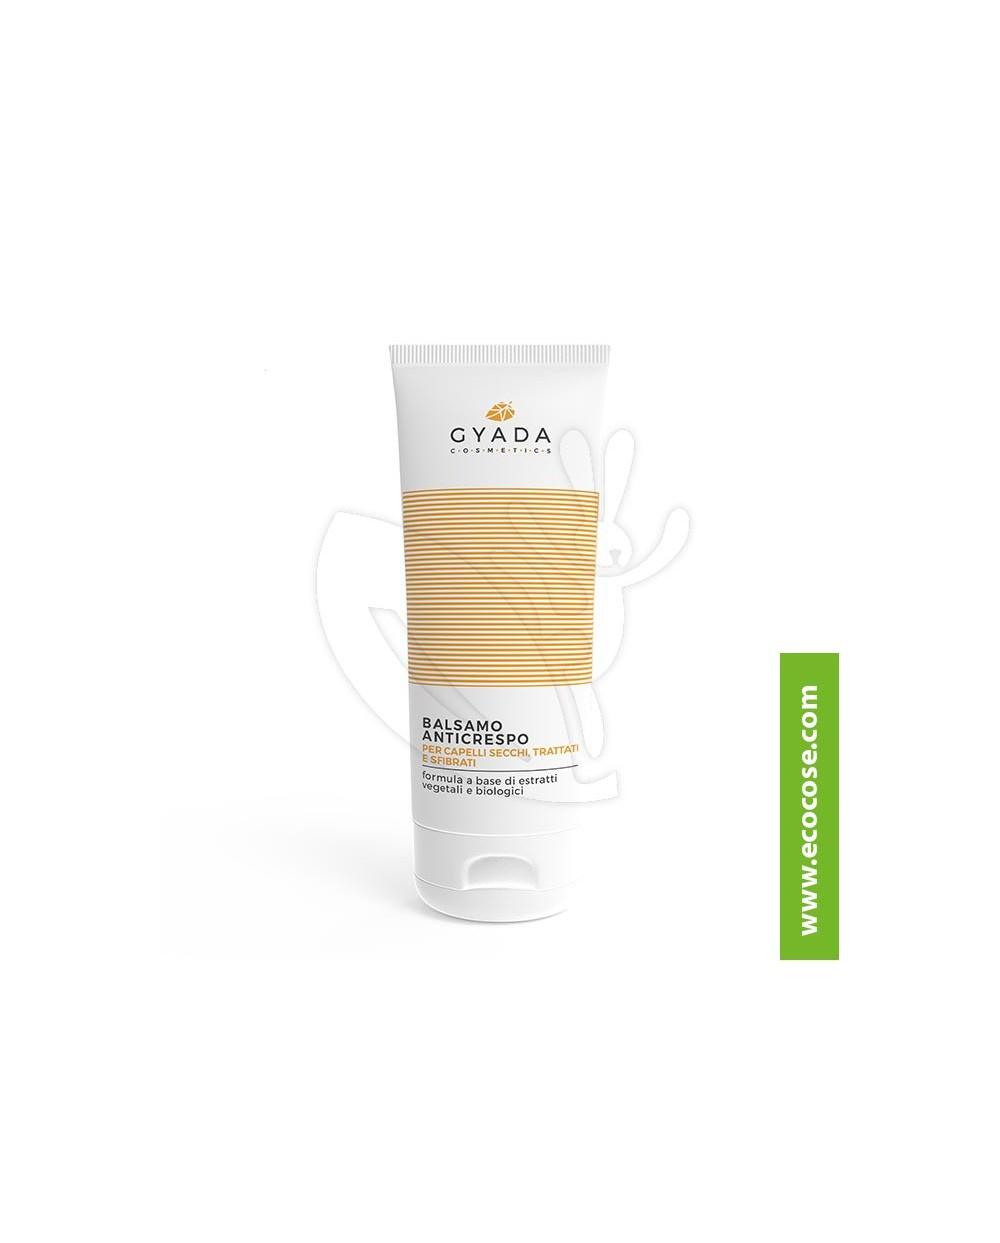 Gyada Cosmetics - Balsamo anticrespo